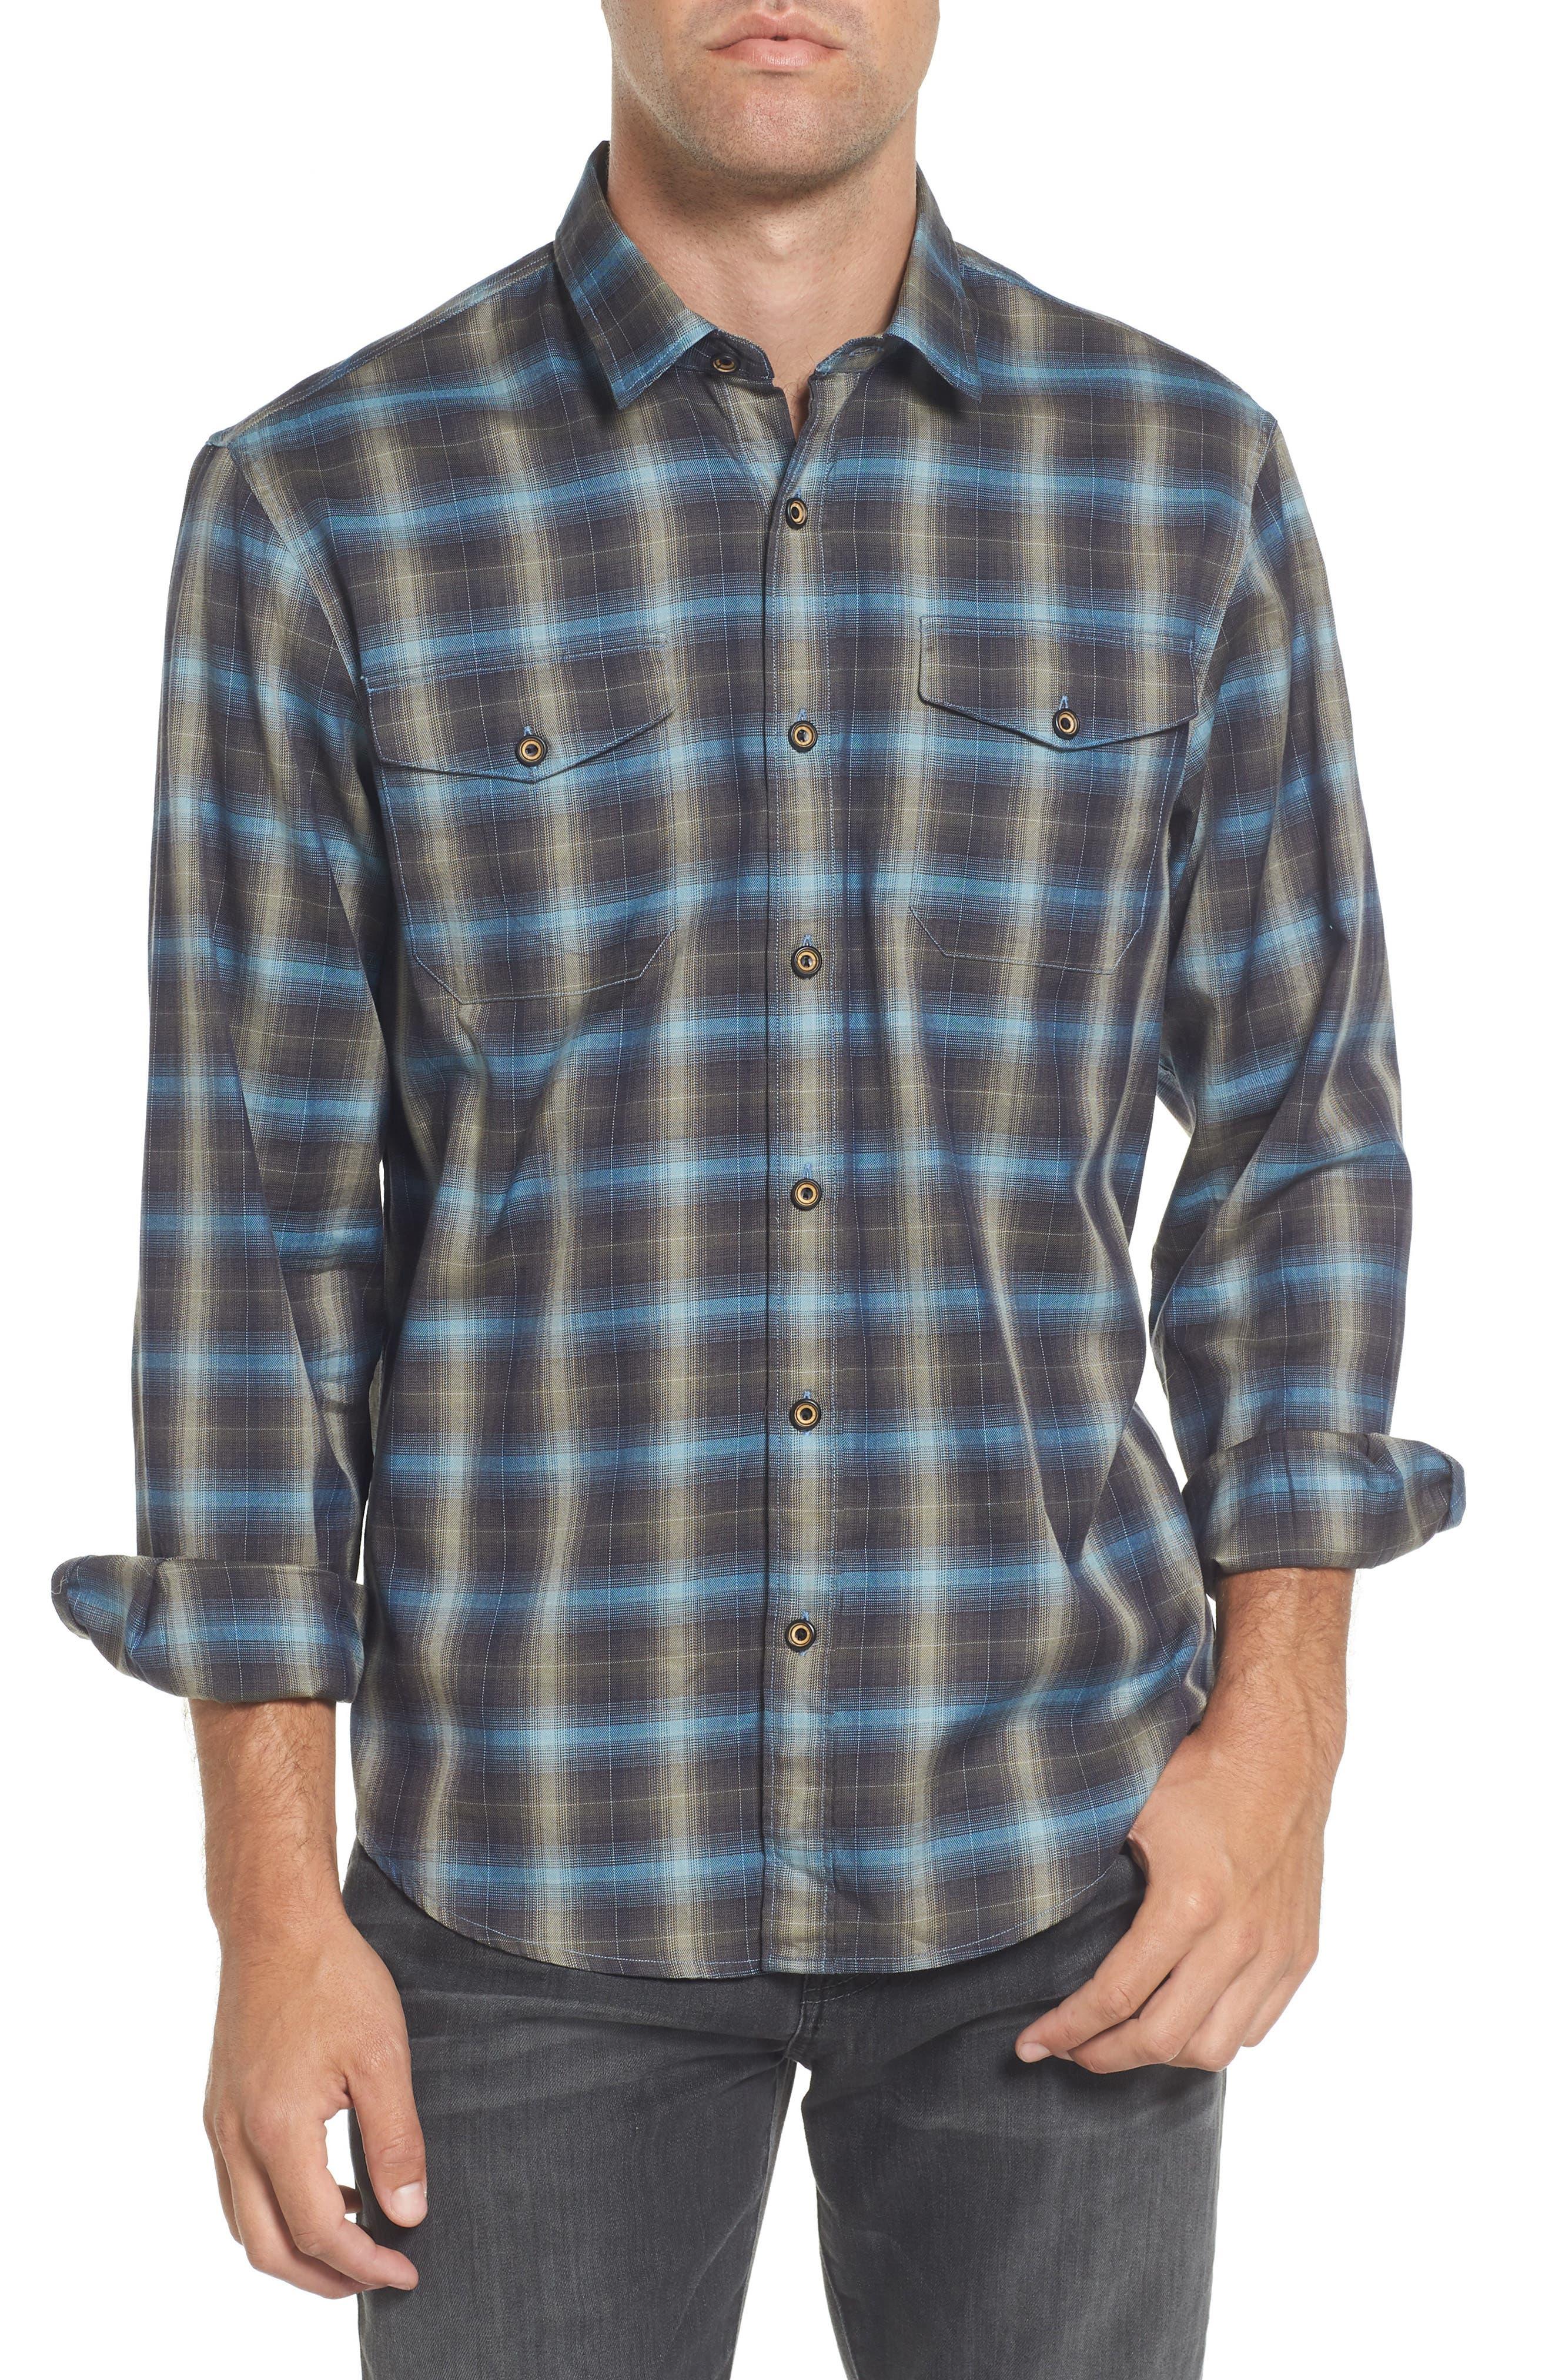 Alternate Image 1 Selected - Coastaoro Walnut Plaid Garment Washed Flannel Shirt